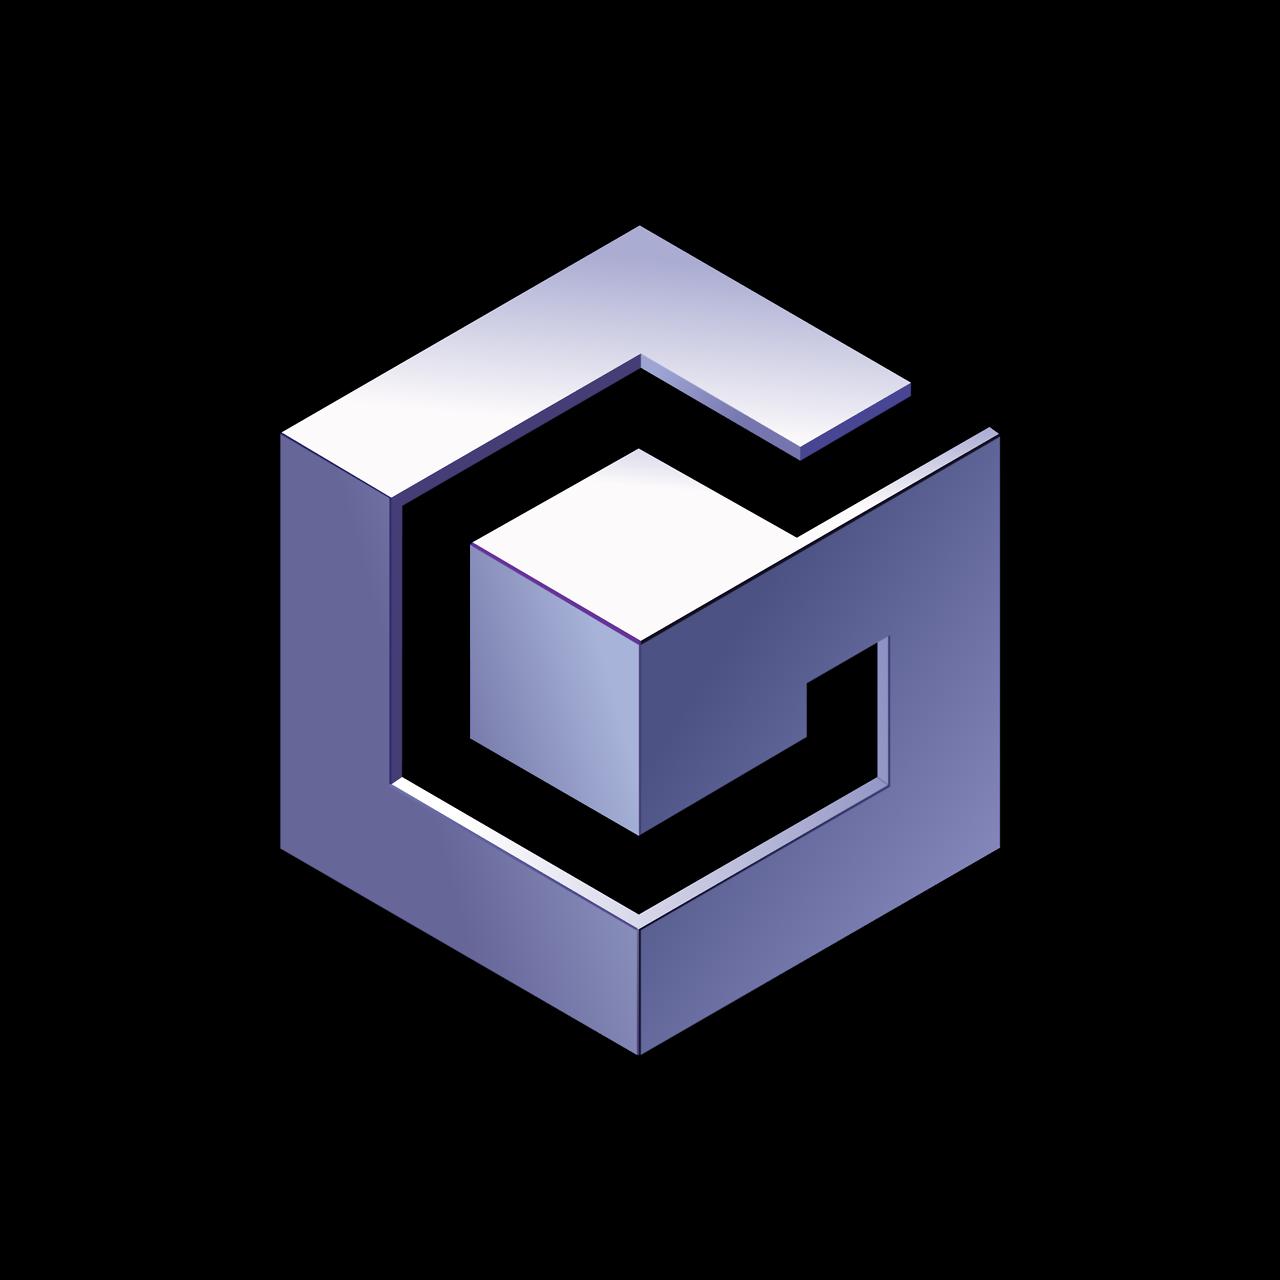 Nintendo Gamecube — Designer Kenichiro Ashida; Firm In